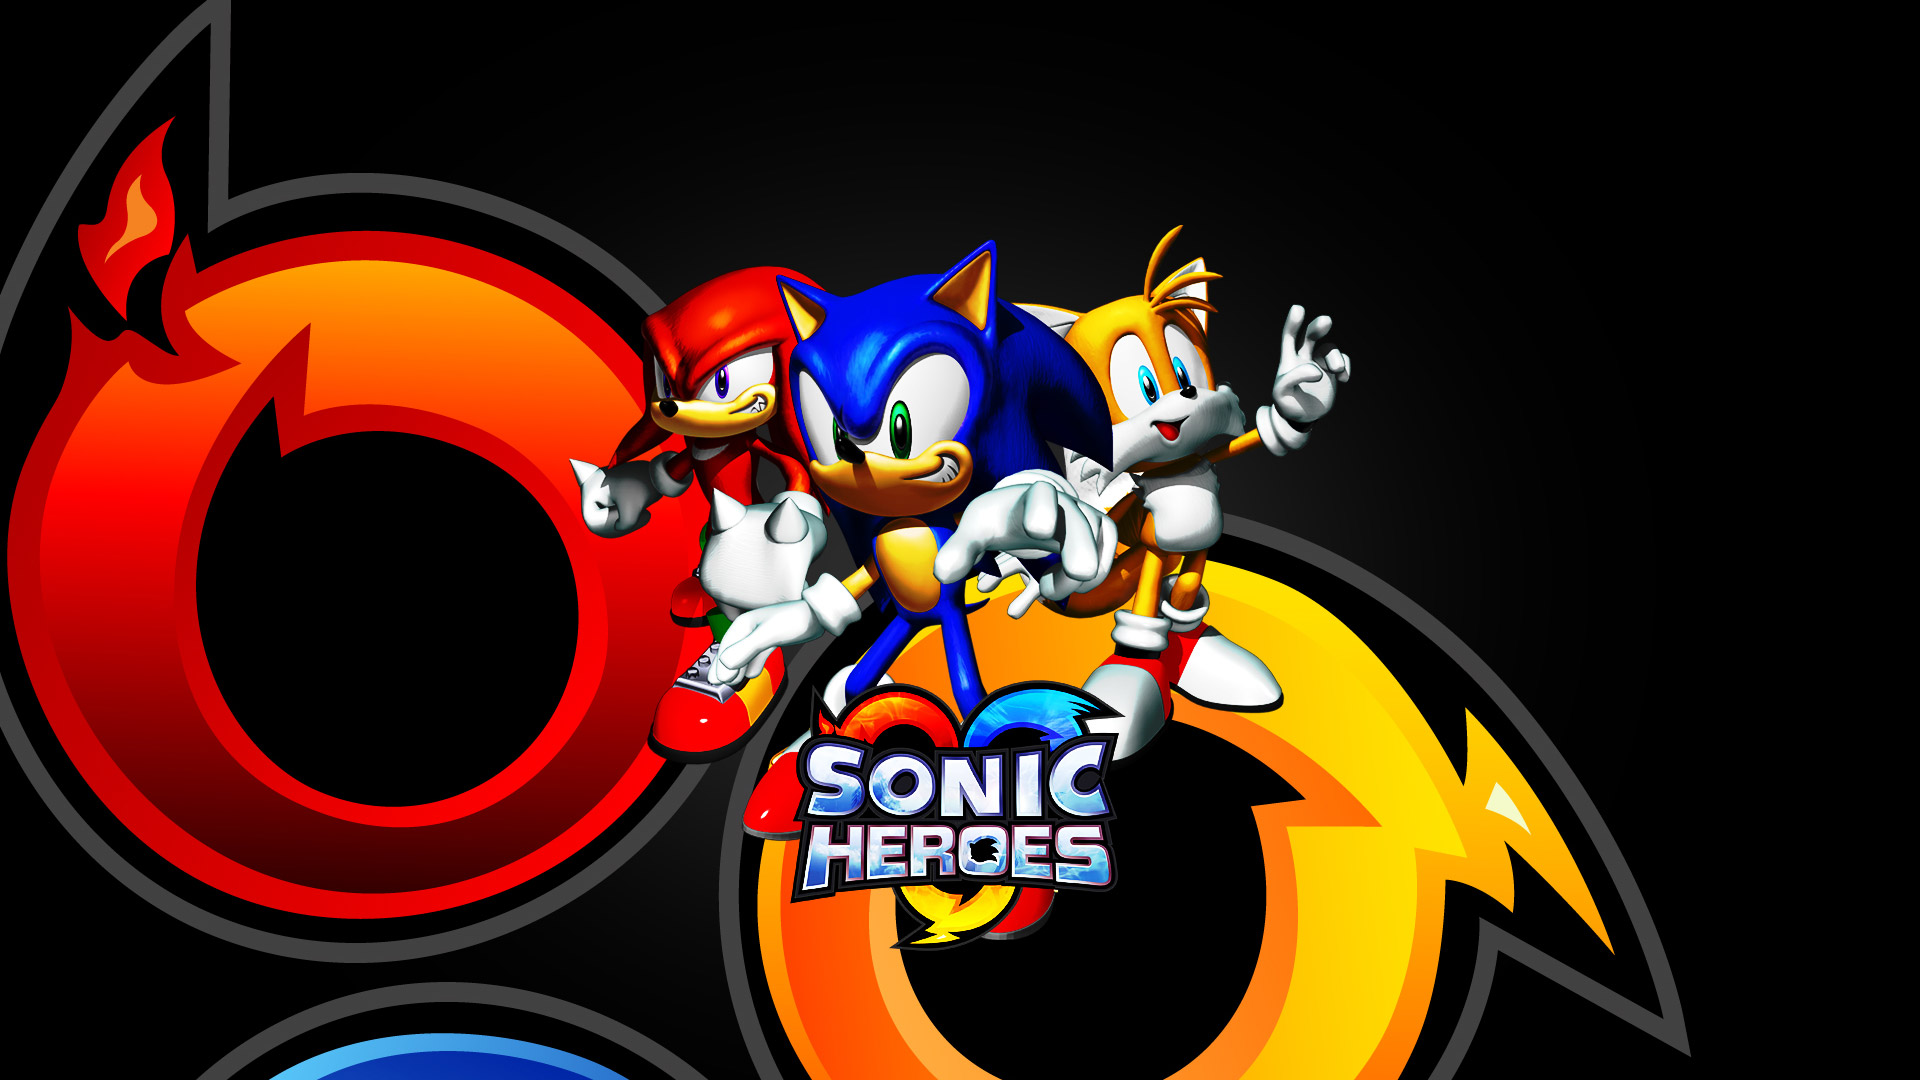 Sonic Heroes Wallpaper in 1920x1080